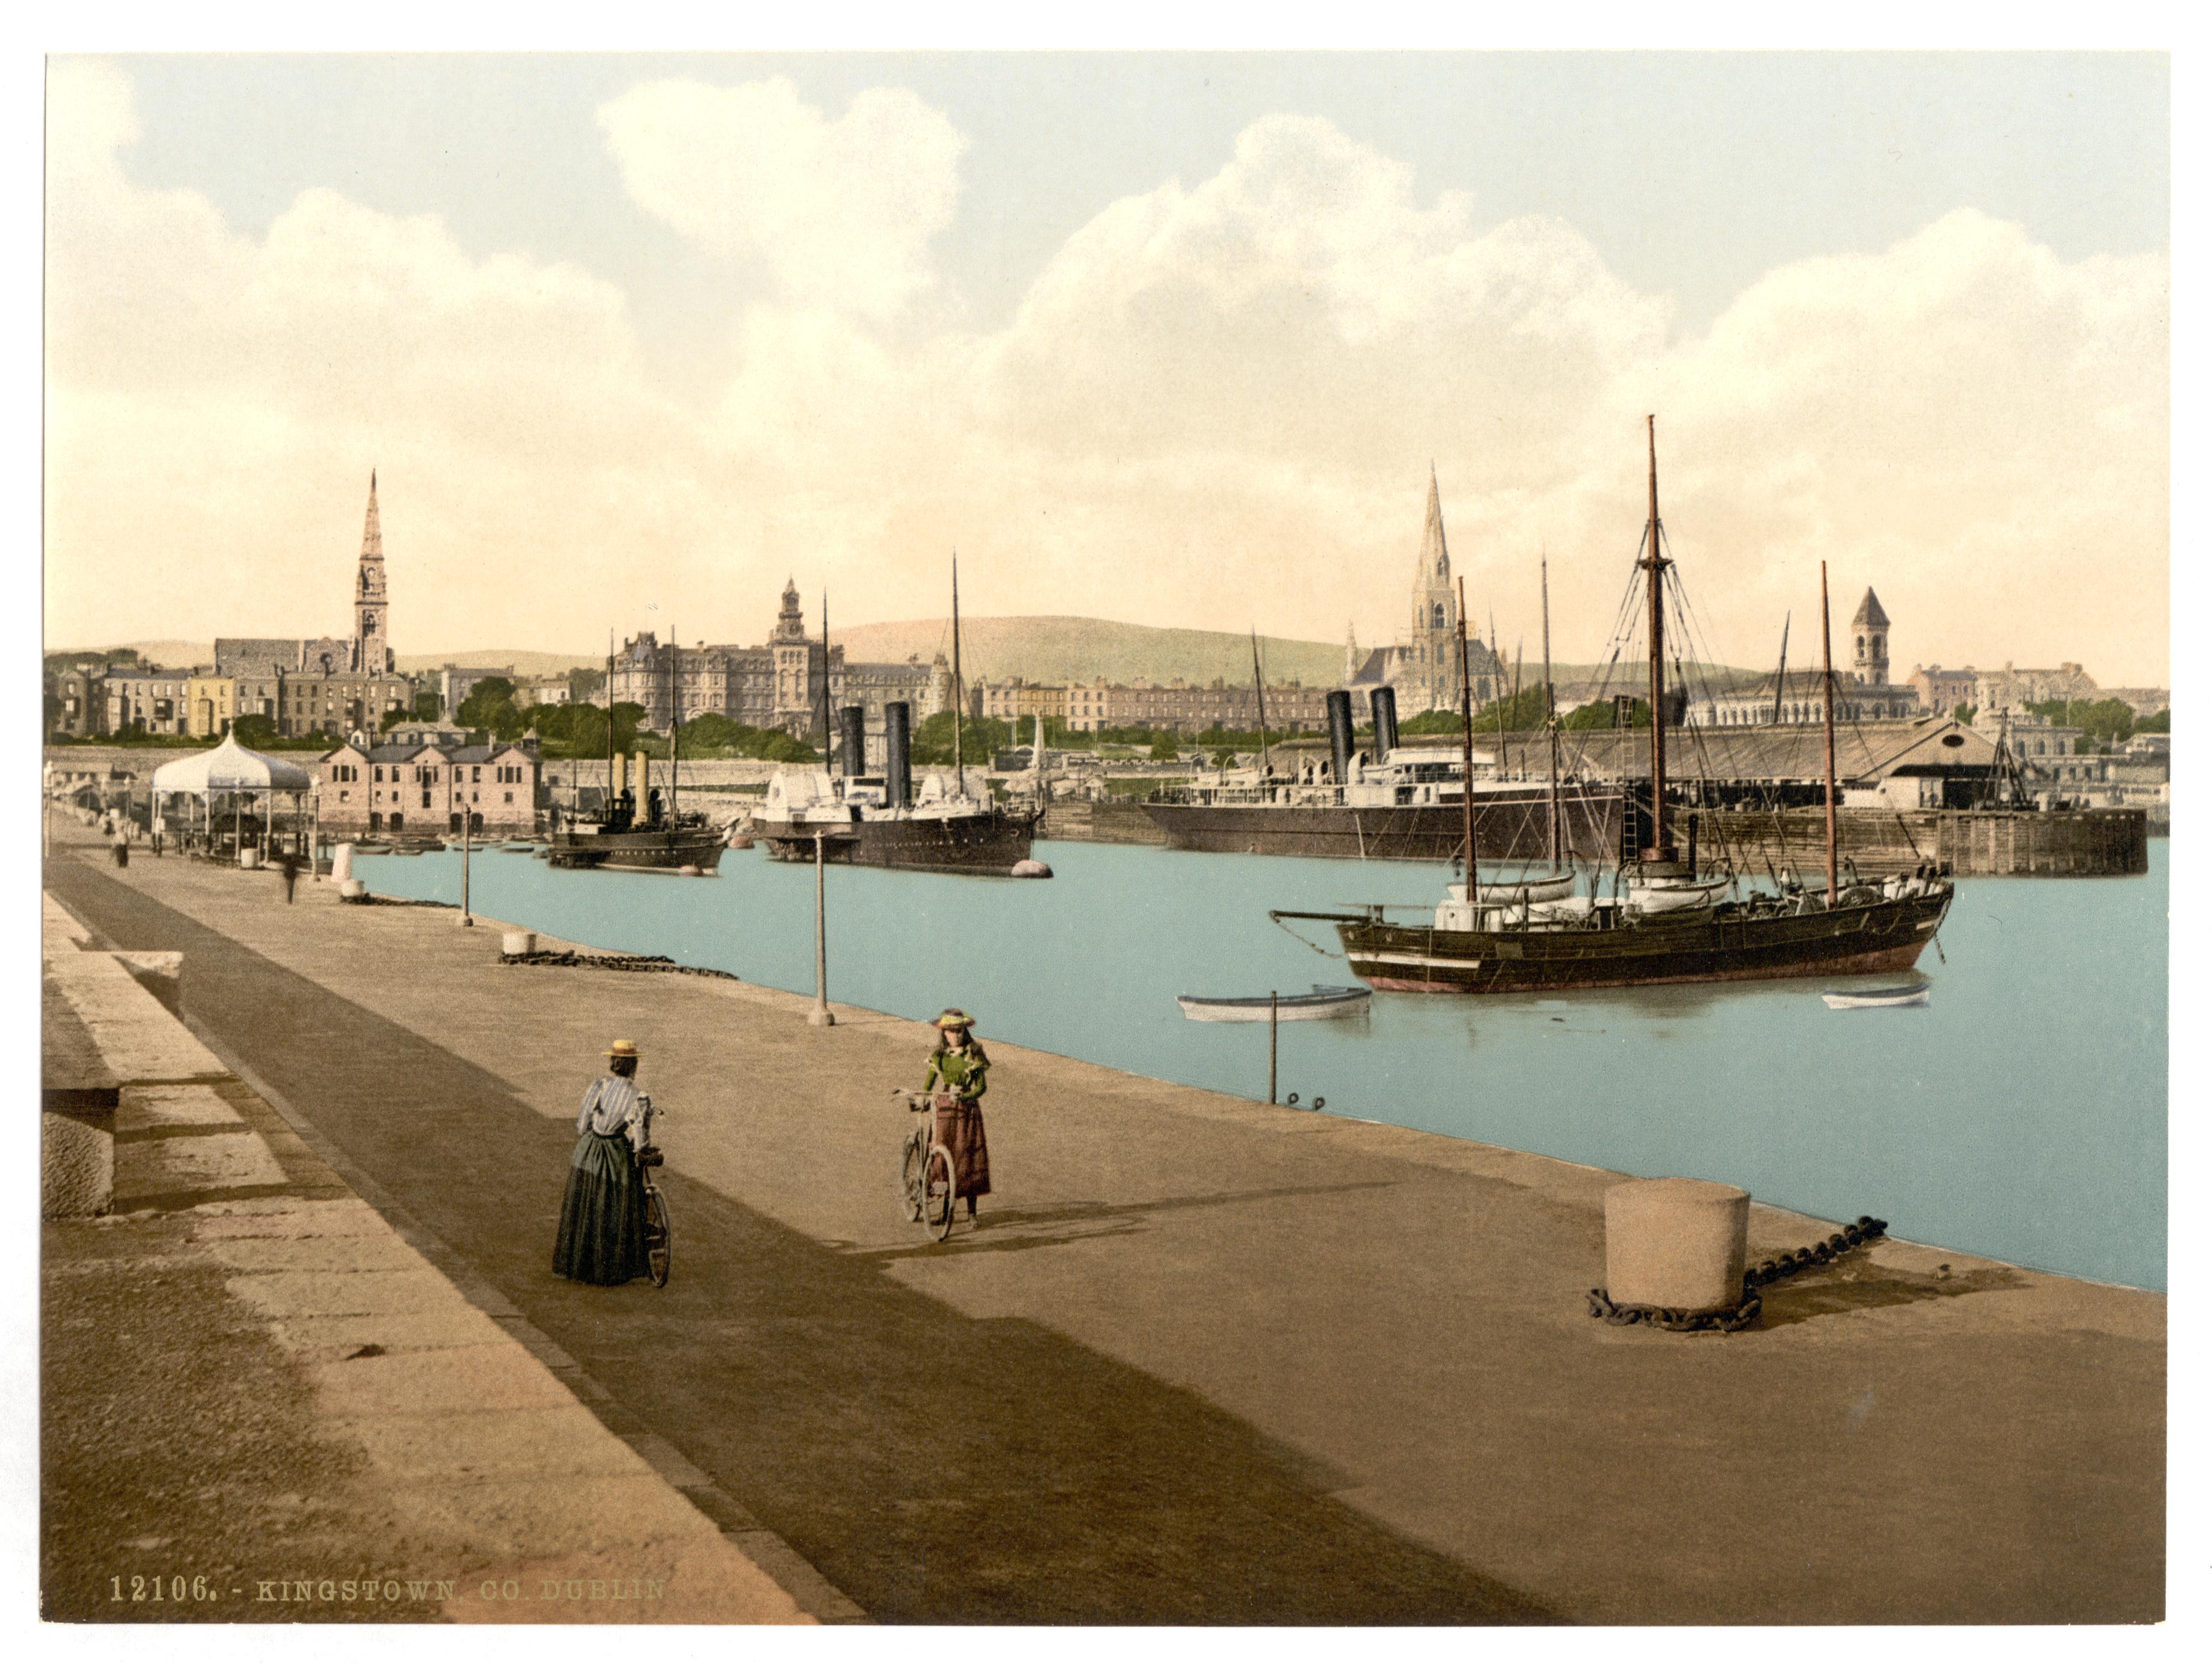 1895 in Ireland